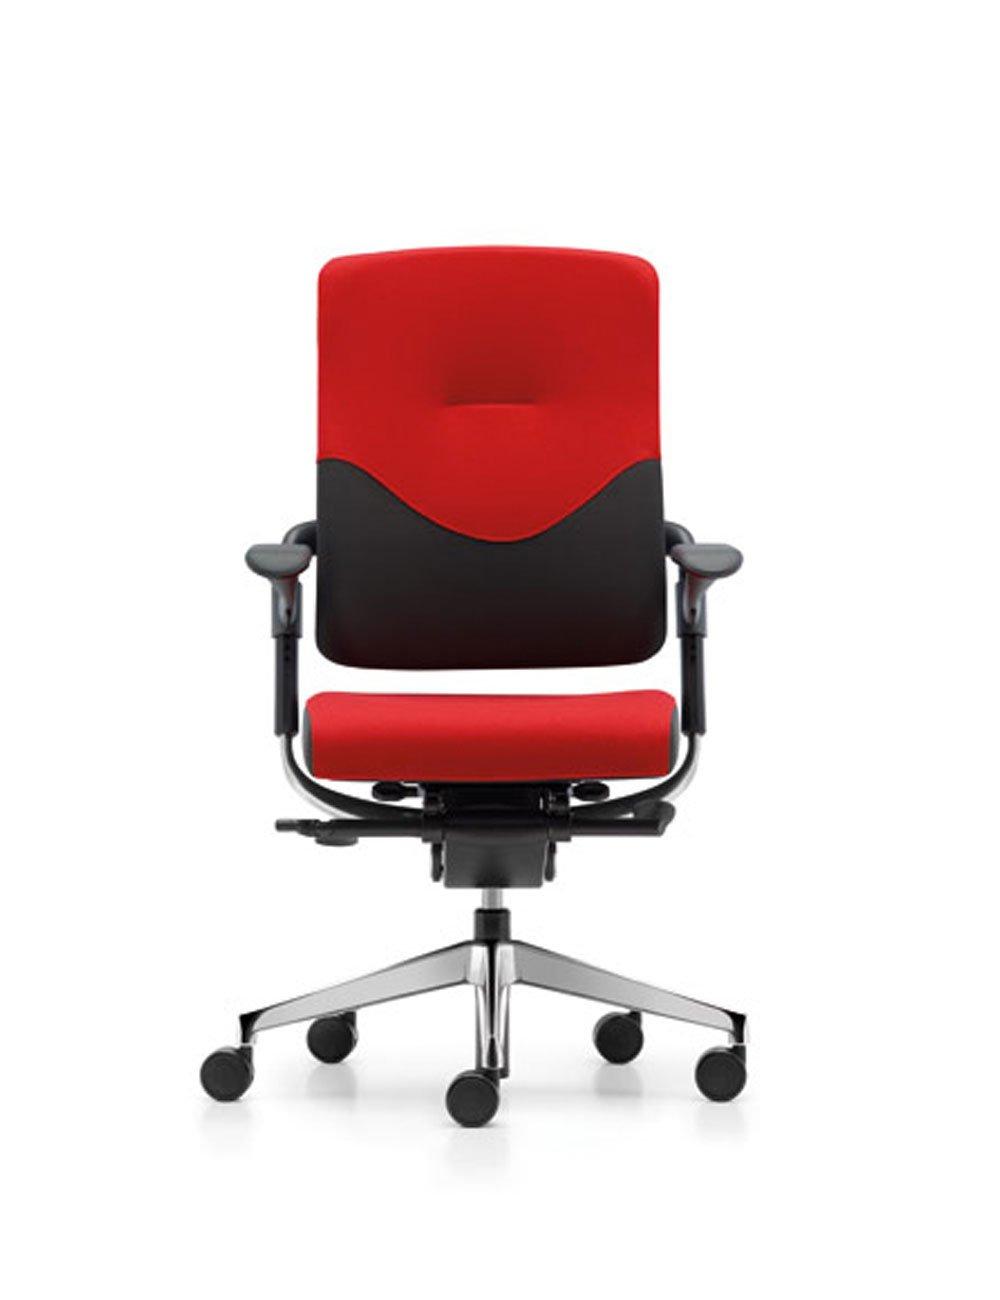 Grahl Xenium Classic Chair Online Ergonomics – Grahl Chair